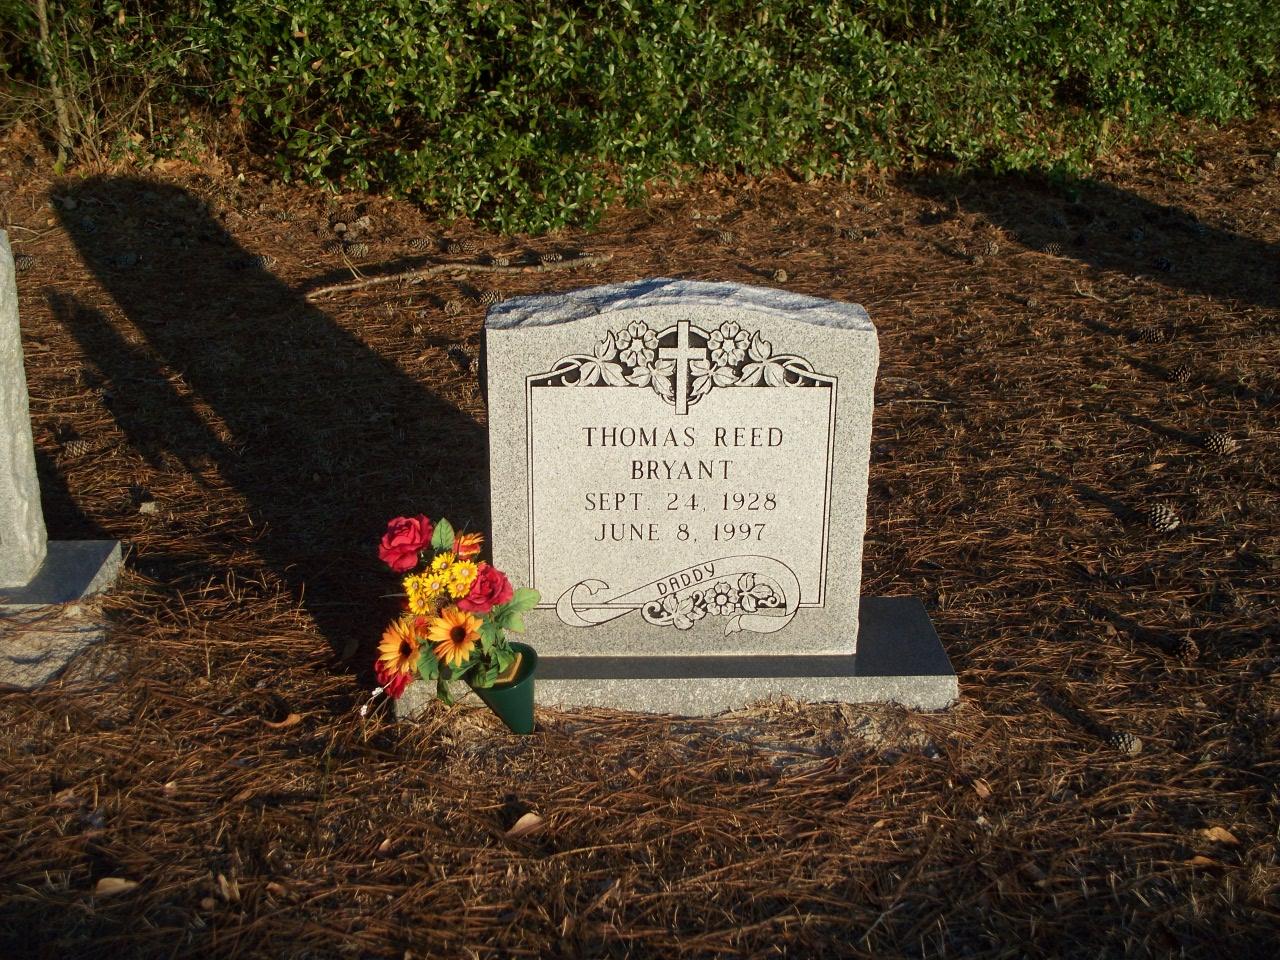 Thomas Reed Bryant